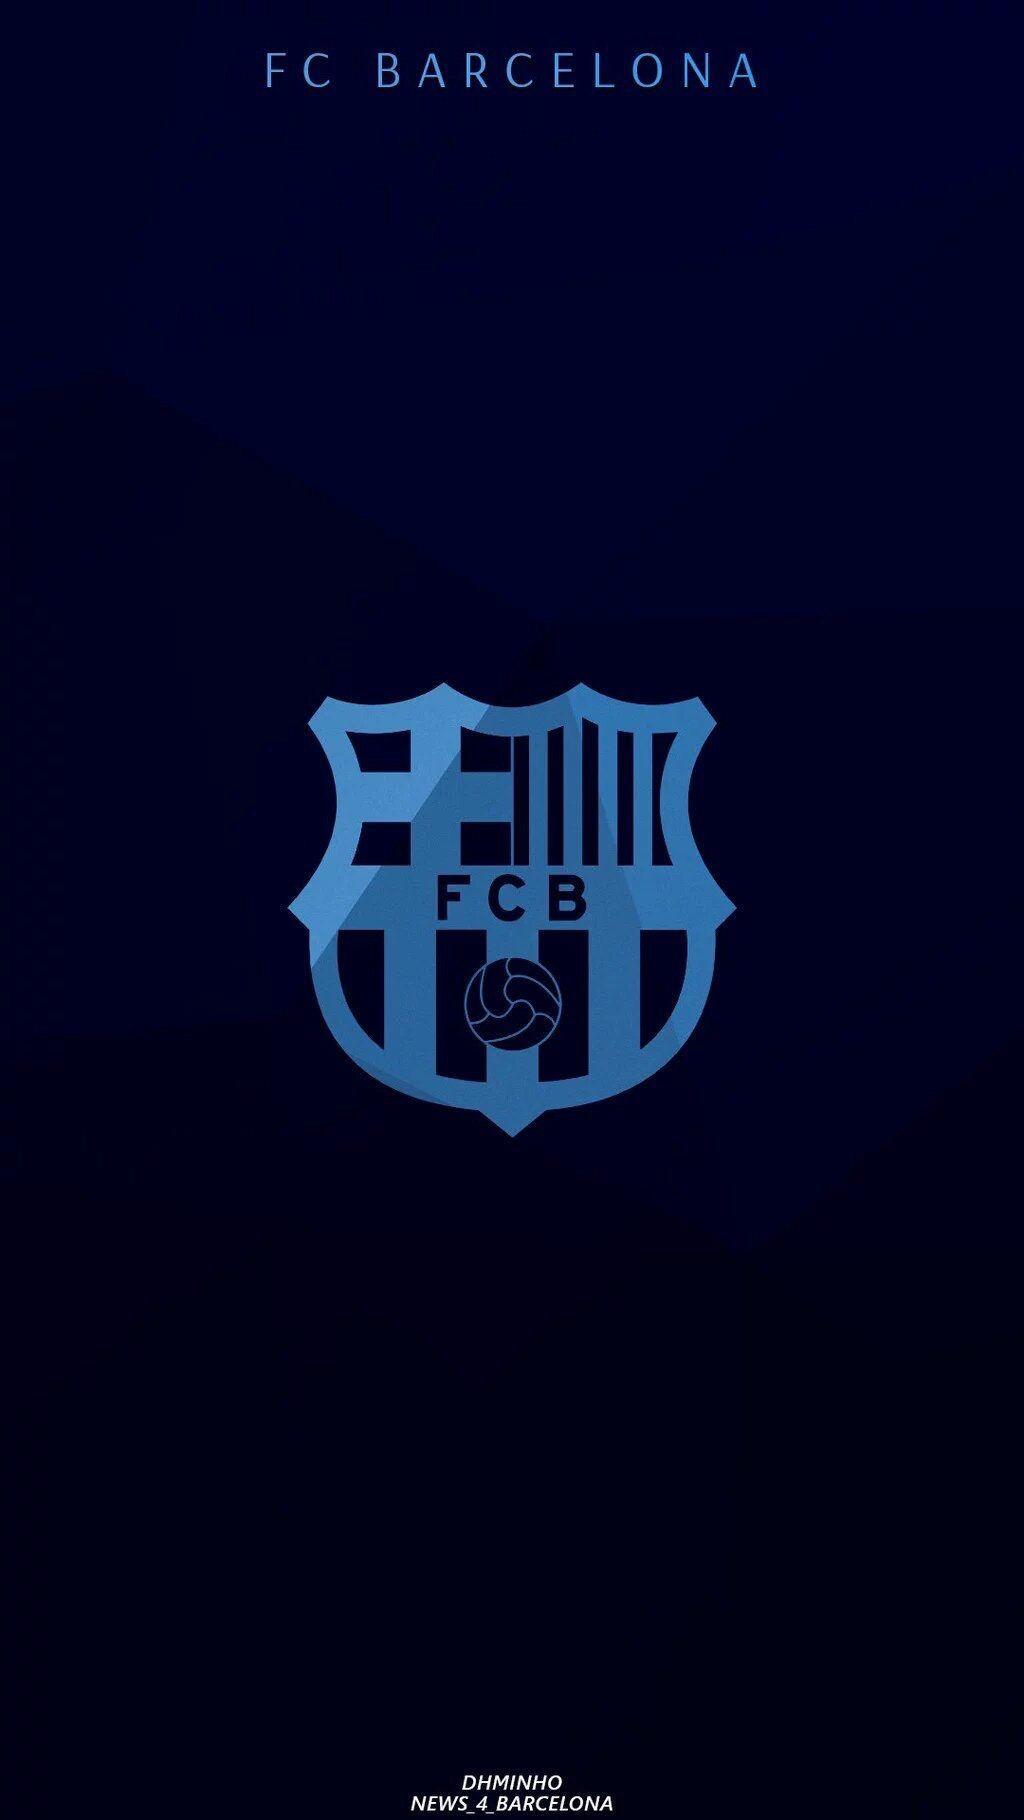 10+ Fc Barcelona Wallpaper Iphone Xr